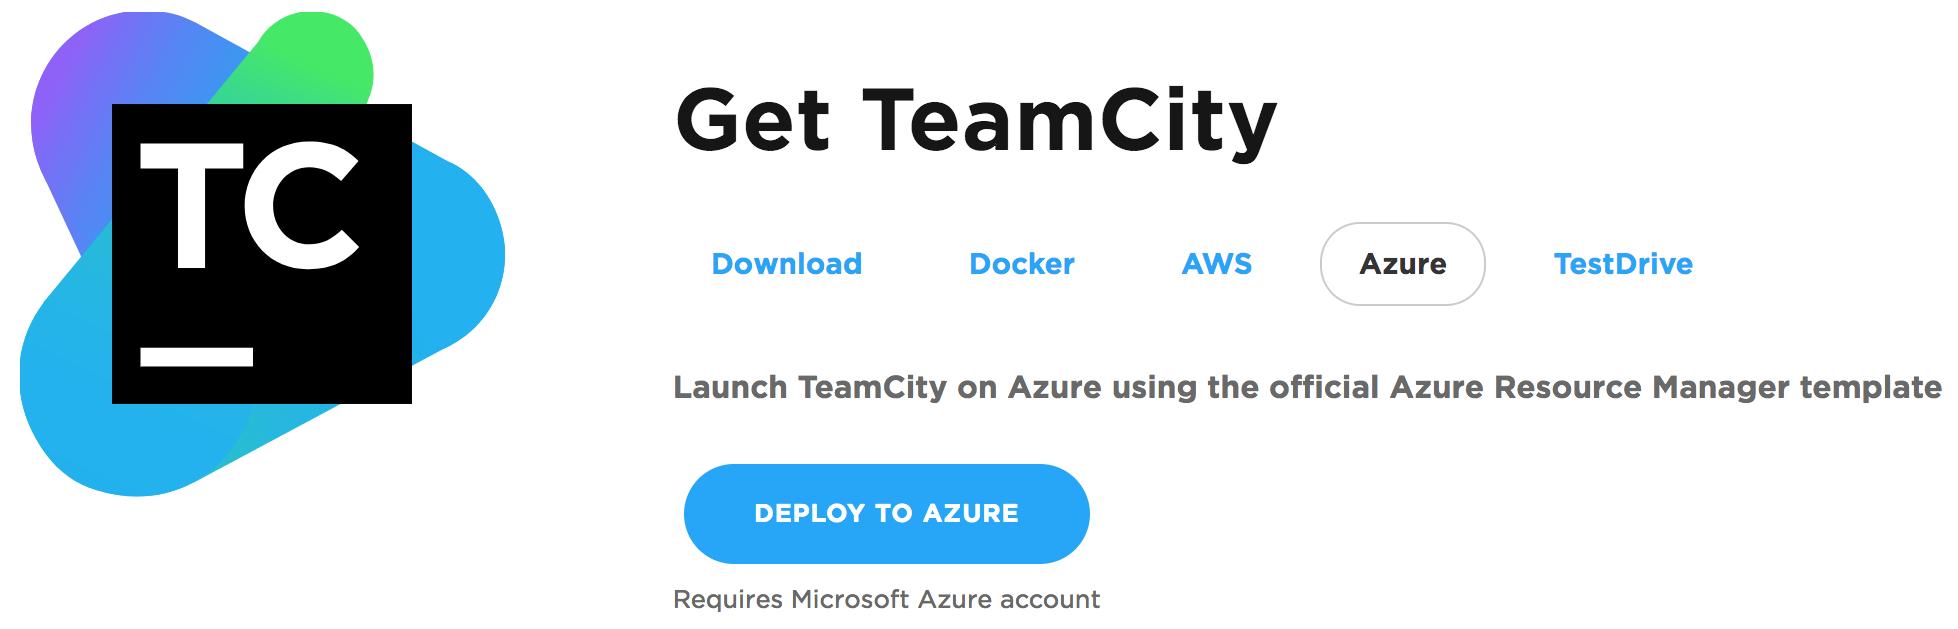 teamcity_azure